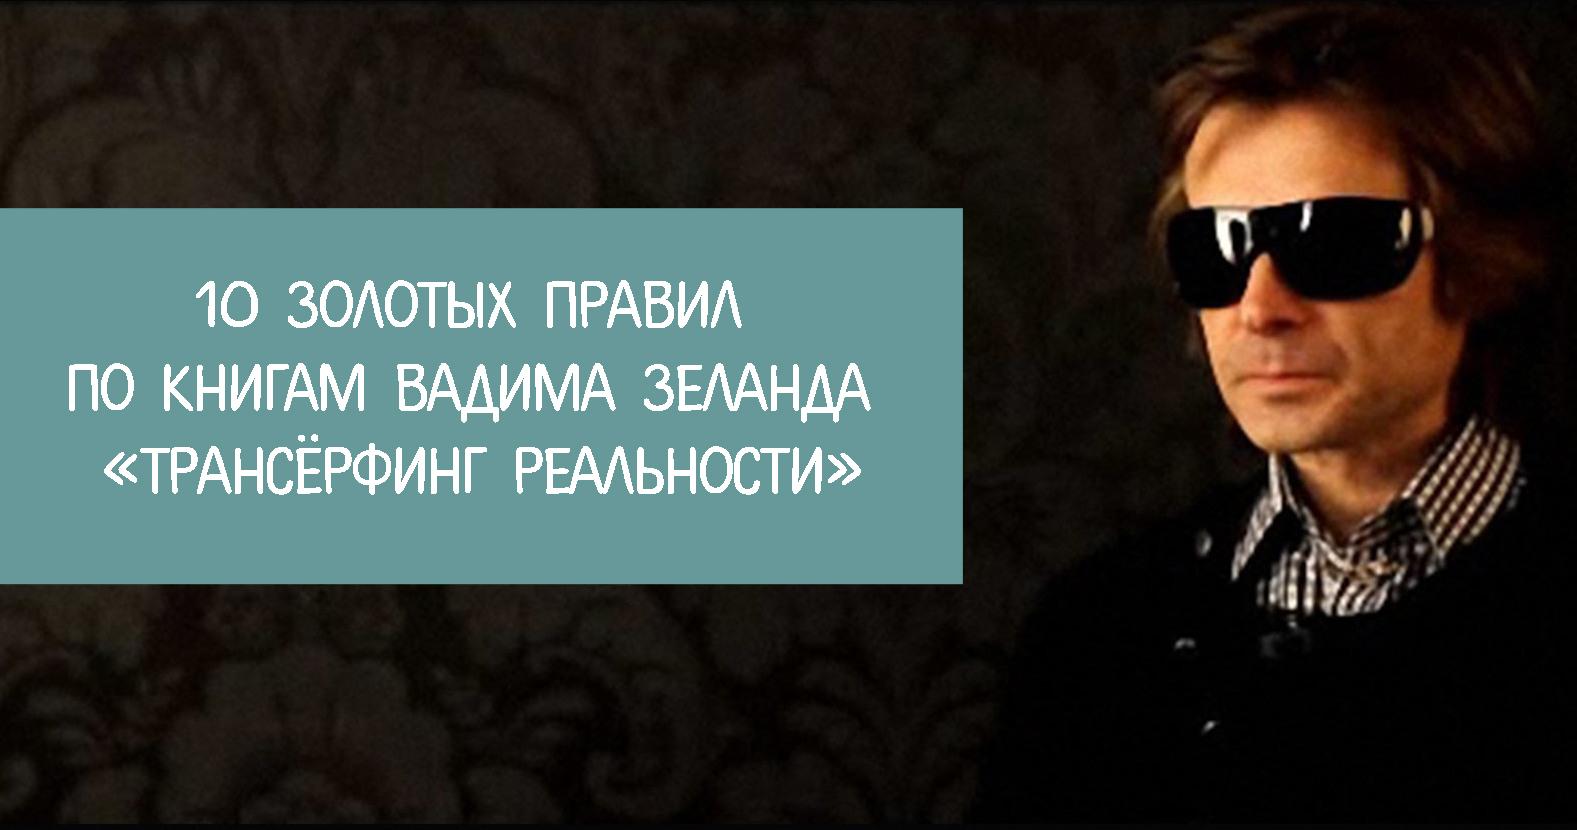 Вадим зеланд | биография | материалы «википедии» | wikipediya-news вадим зеланд | биография | материалы «википедии» — wikipediya-news